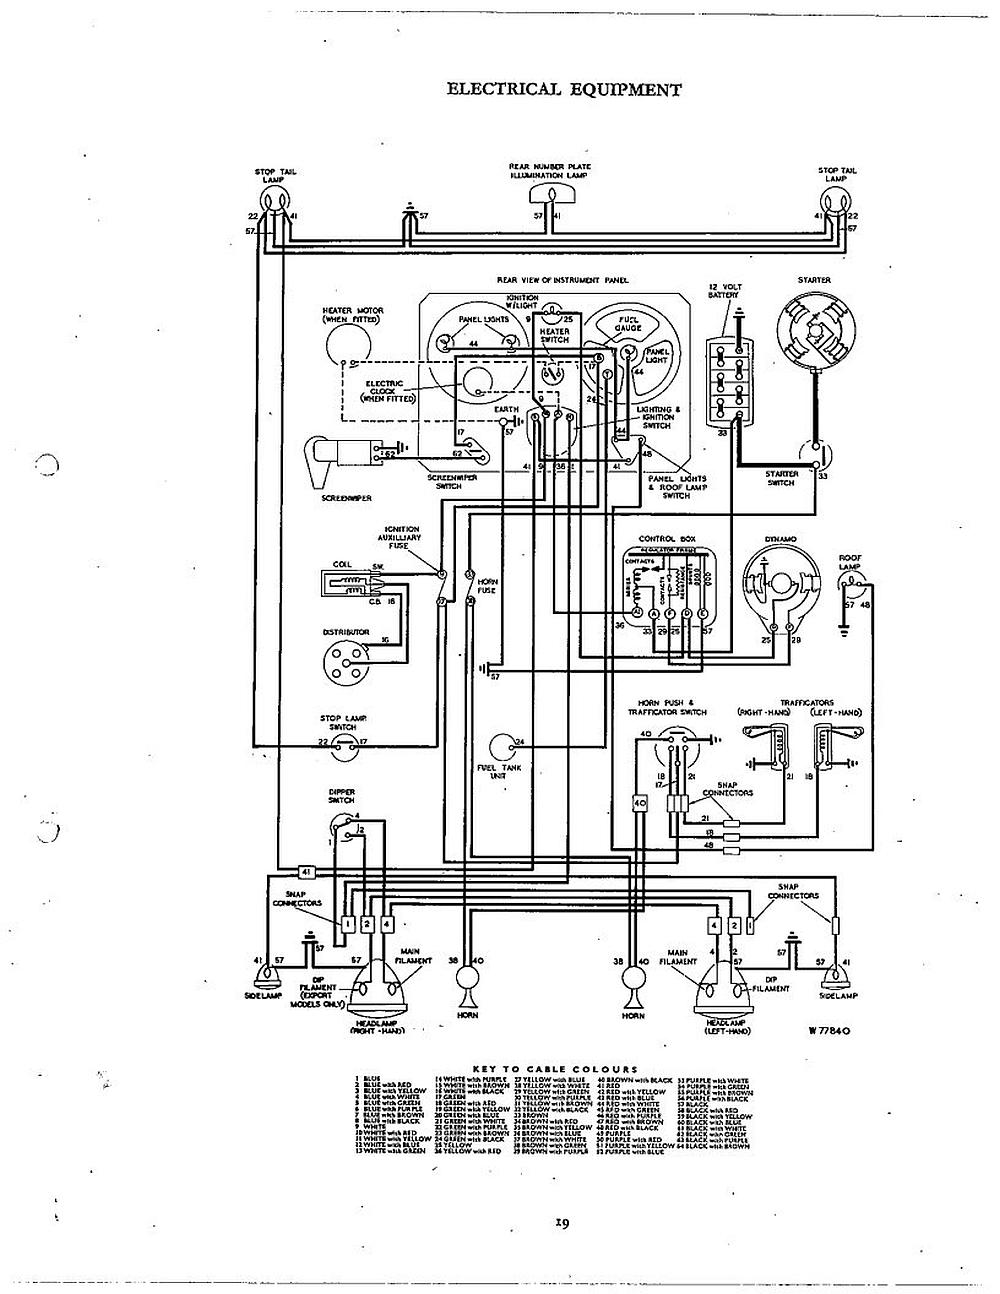 husqvarna rz 4615 wiring diagram